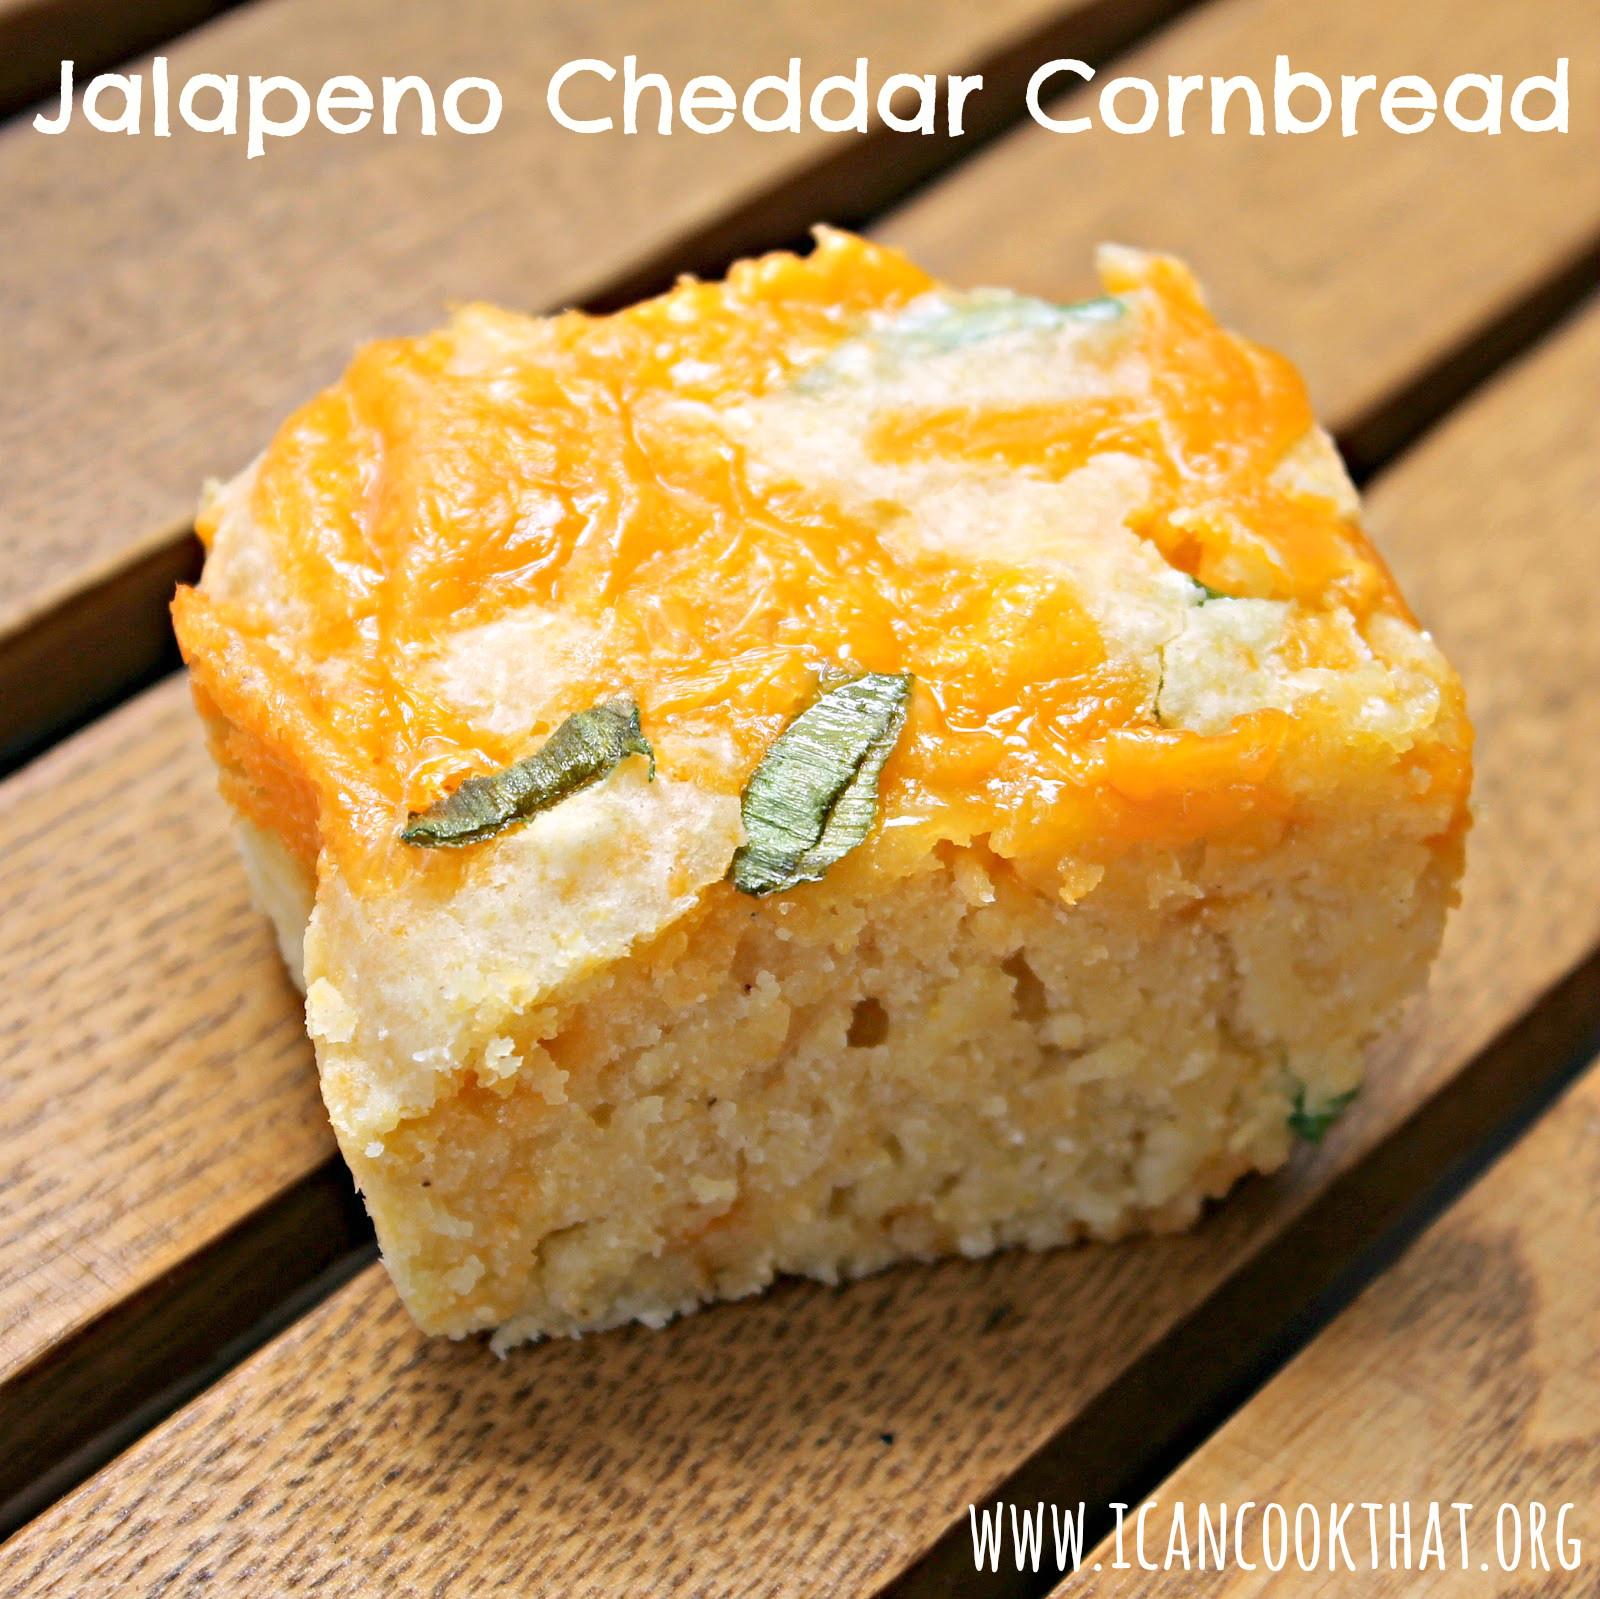 Jalapeno Cheese Cornbread  Jalapeno Cheddar Cornbread Recipe I Can Cook That